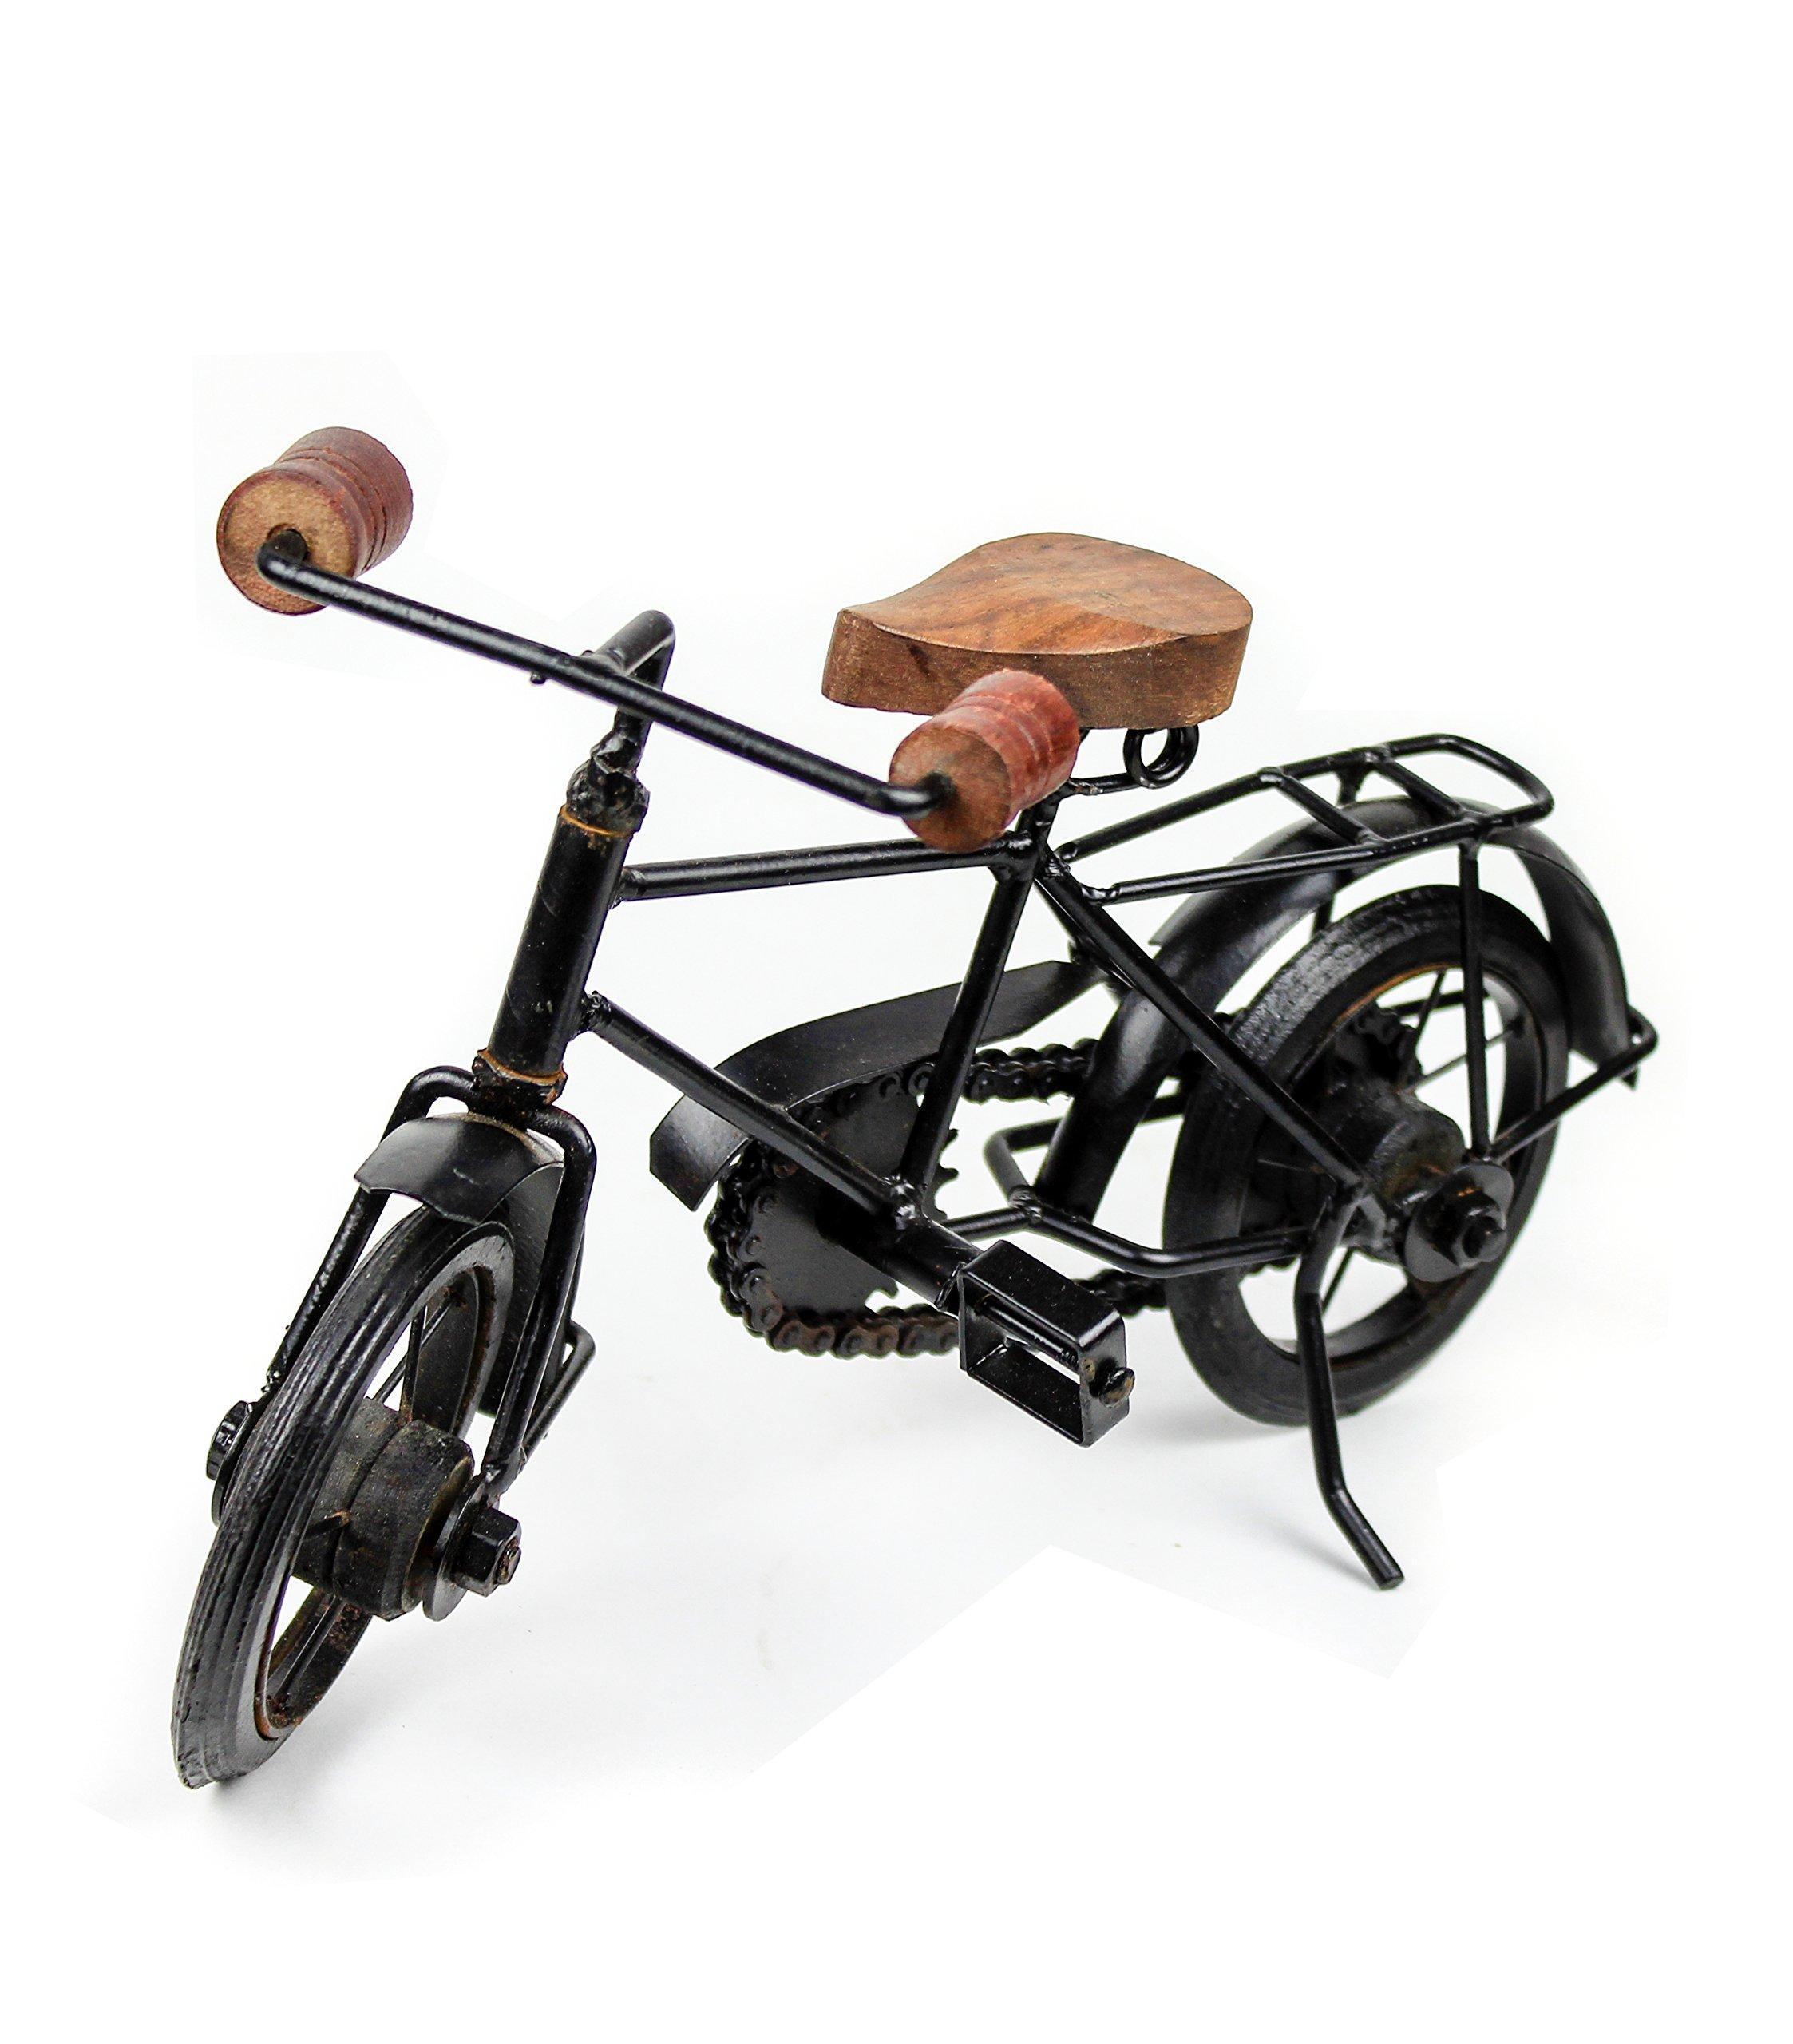 Nagina International Home Decor Iron Metal Crafted Beautiful Finger Bike   Table Decor Gifts Vehicle   Games Toy Cycle (Postman) by Nagina International (Image #2)